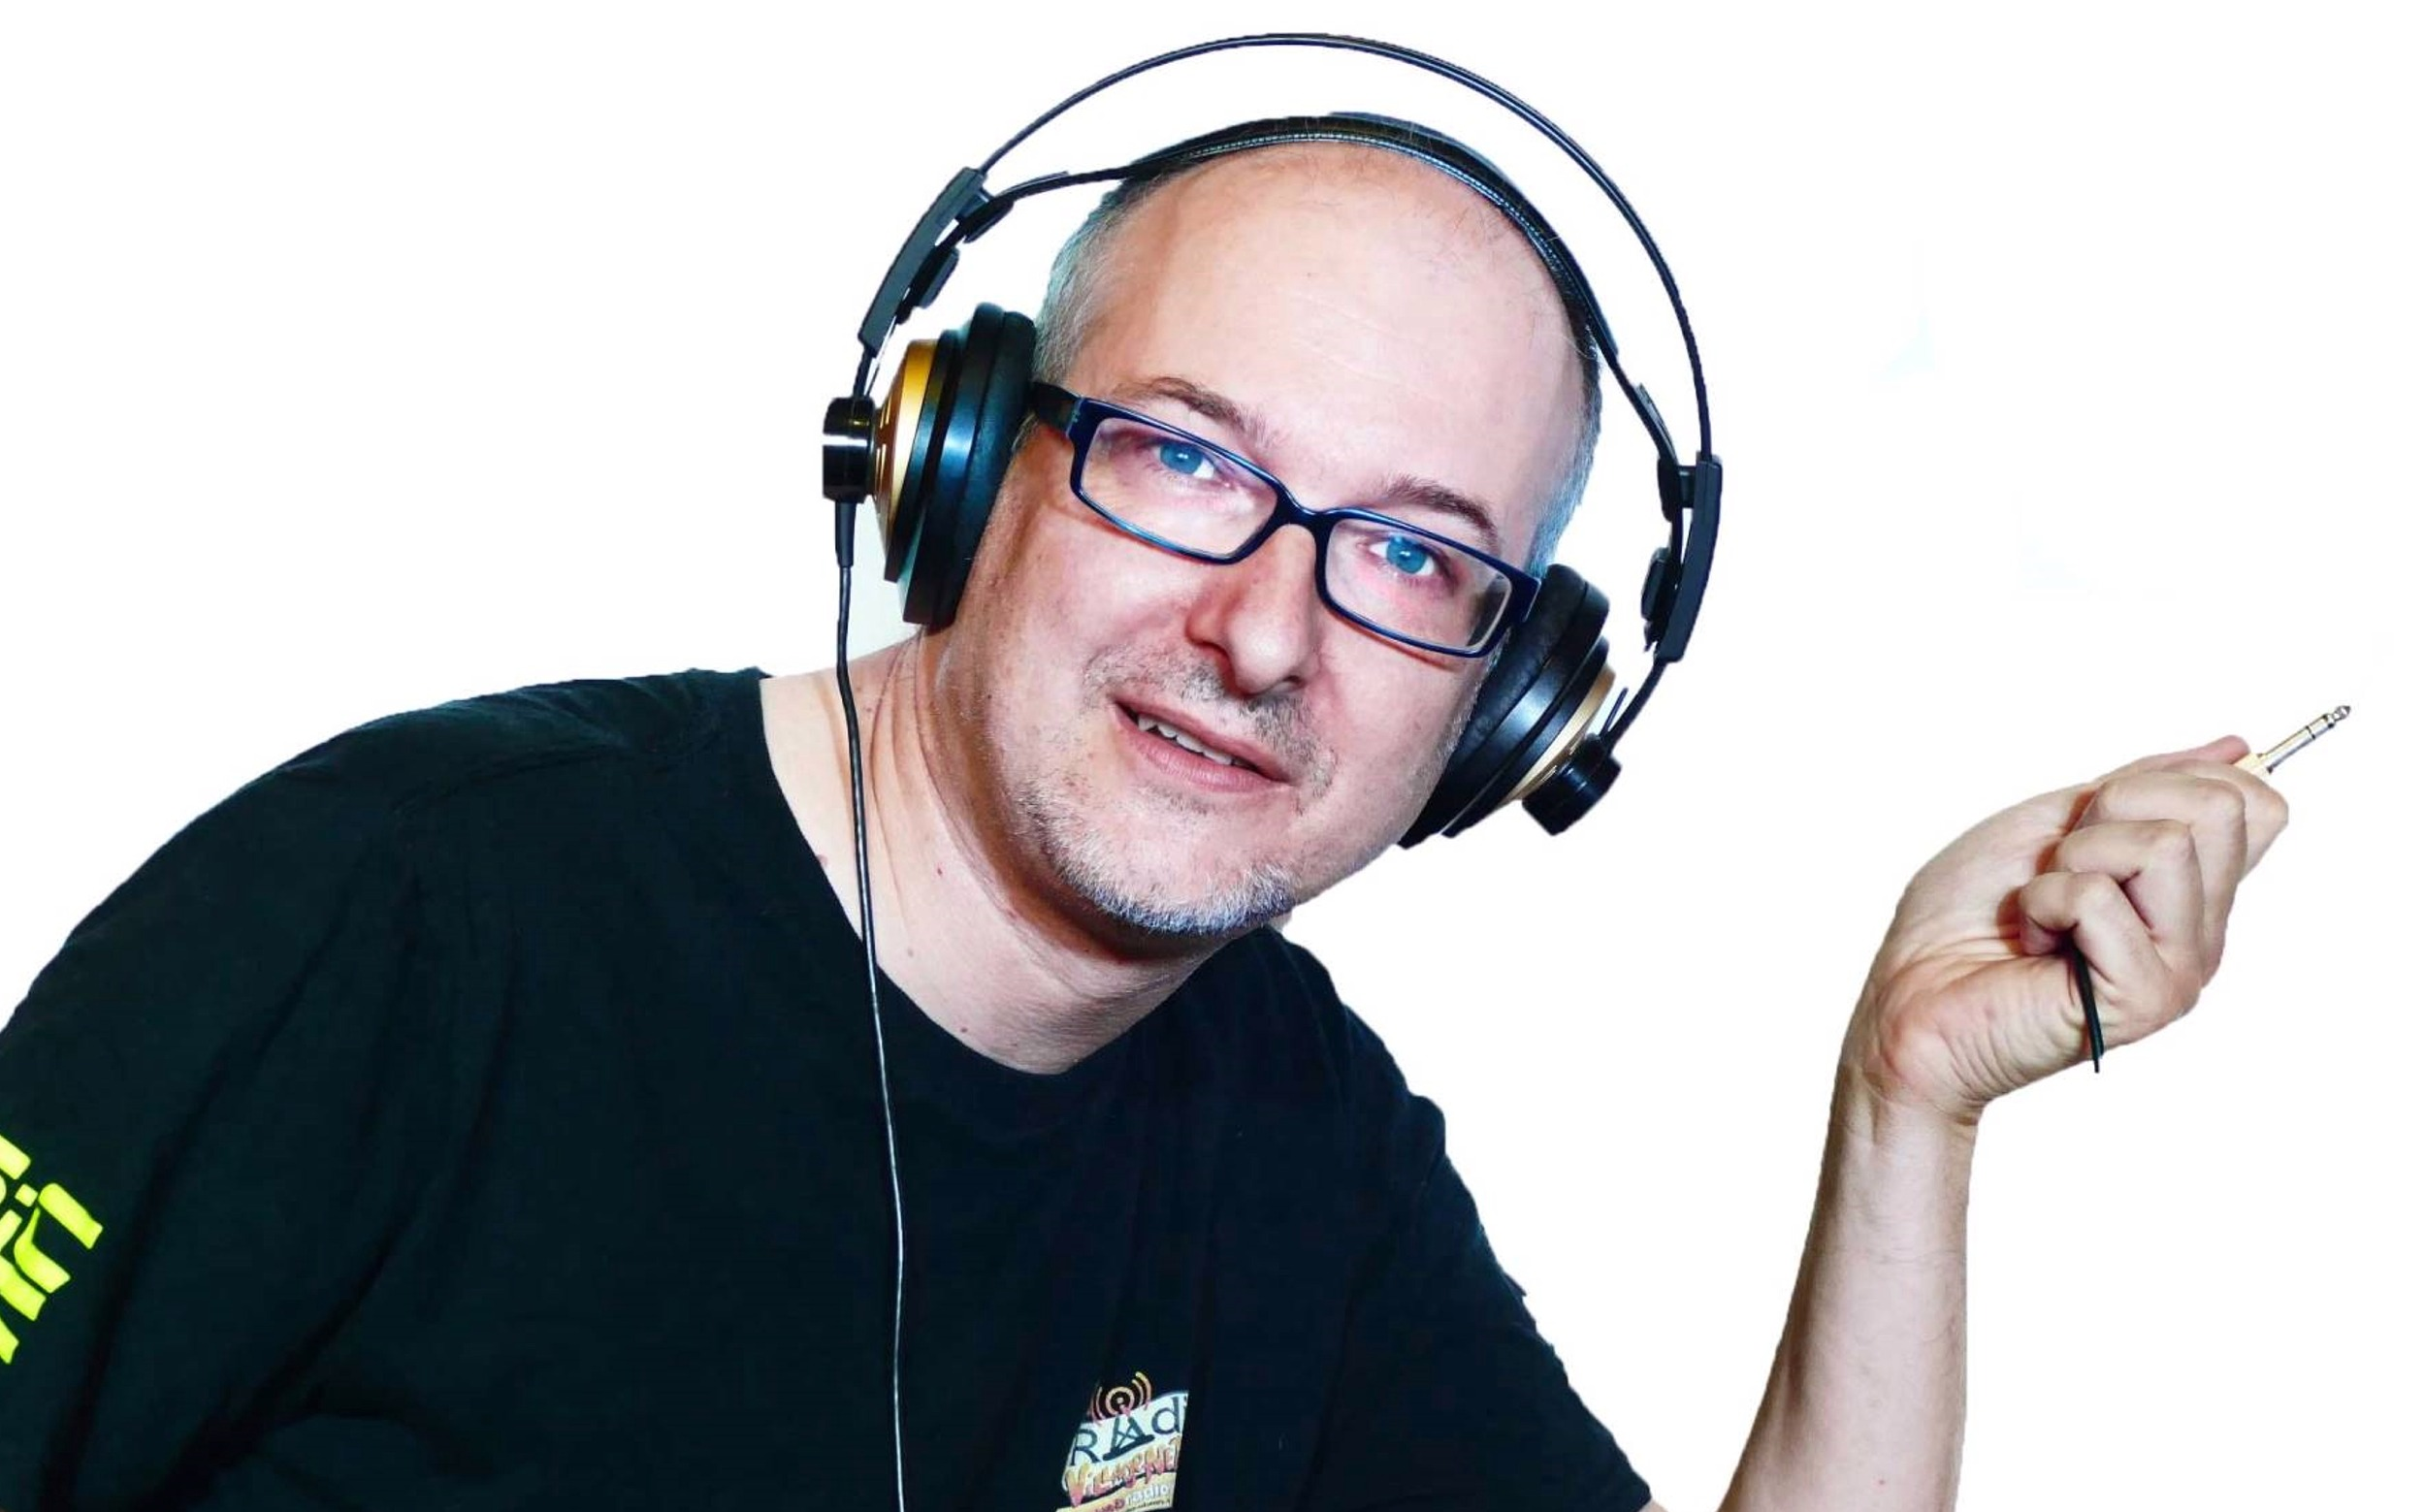 MAX CASTELNUOVO